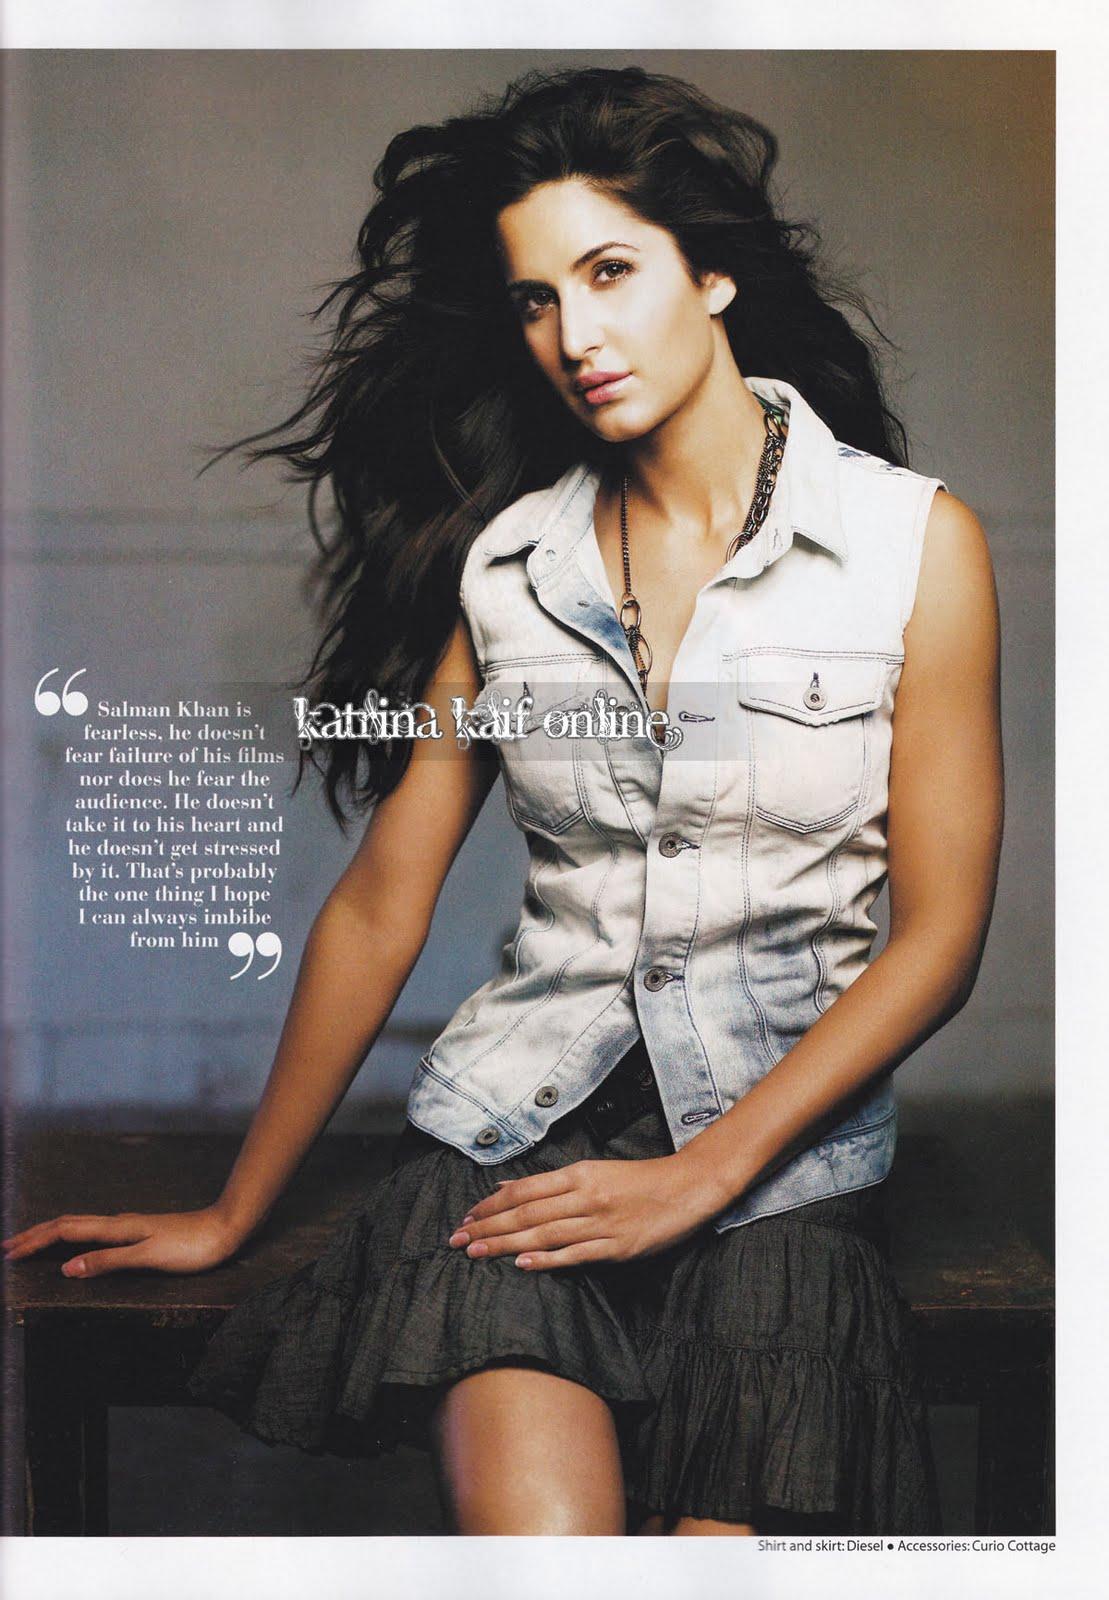 Katrina Kaif Sexy Photos From The Cover Of Filmfare -2446